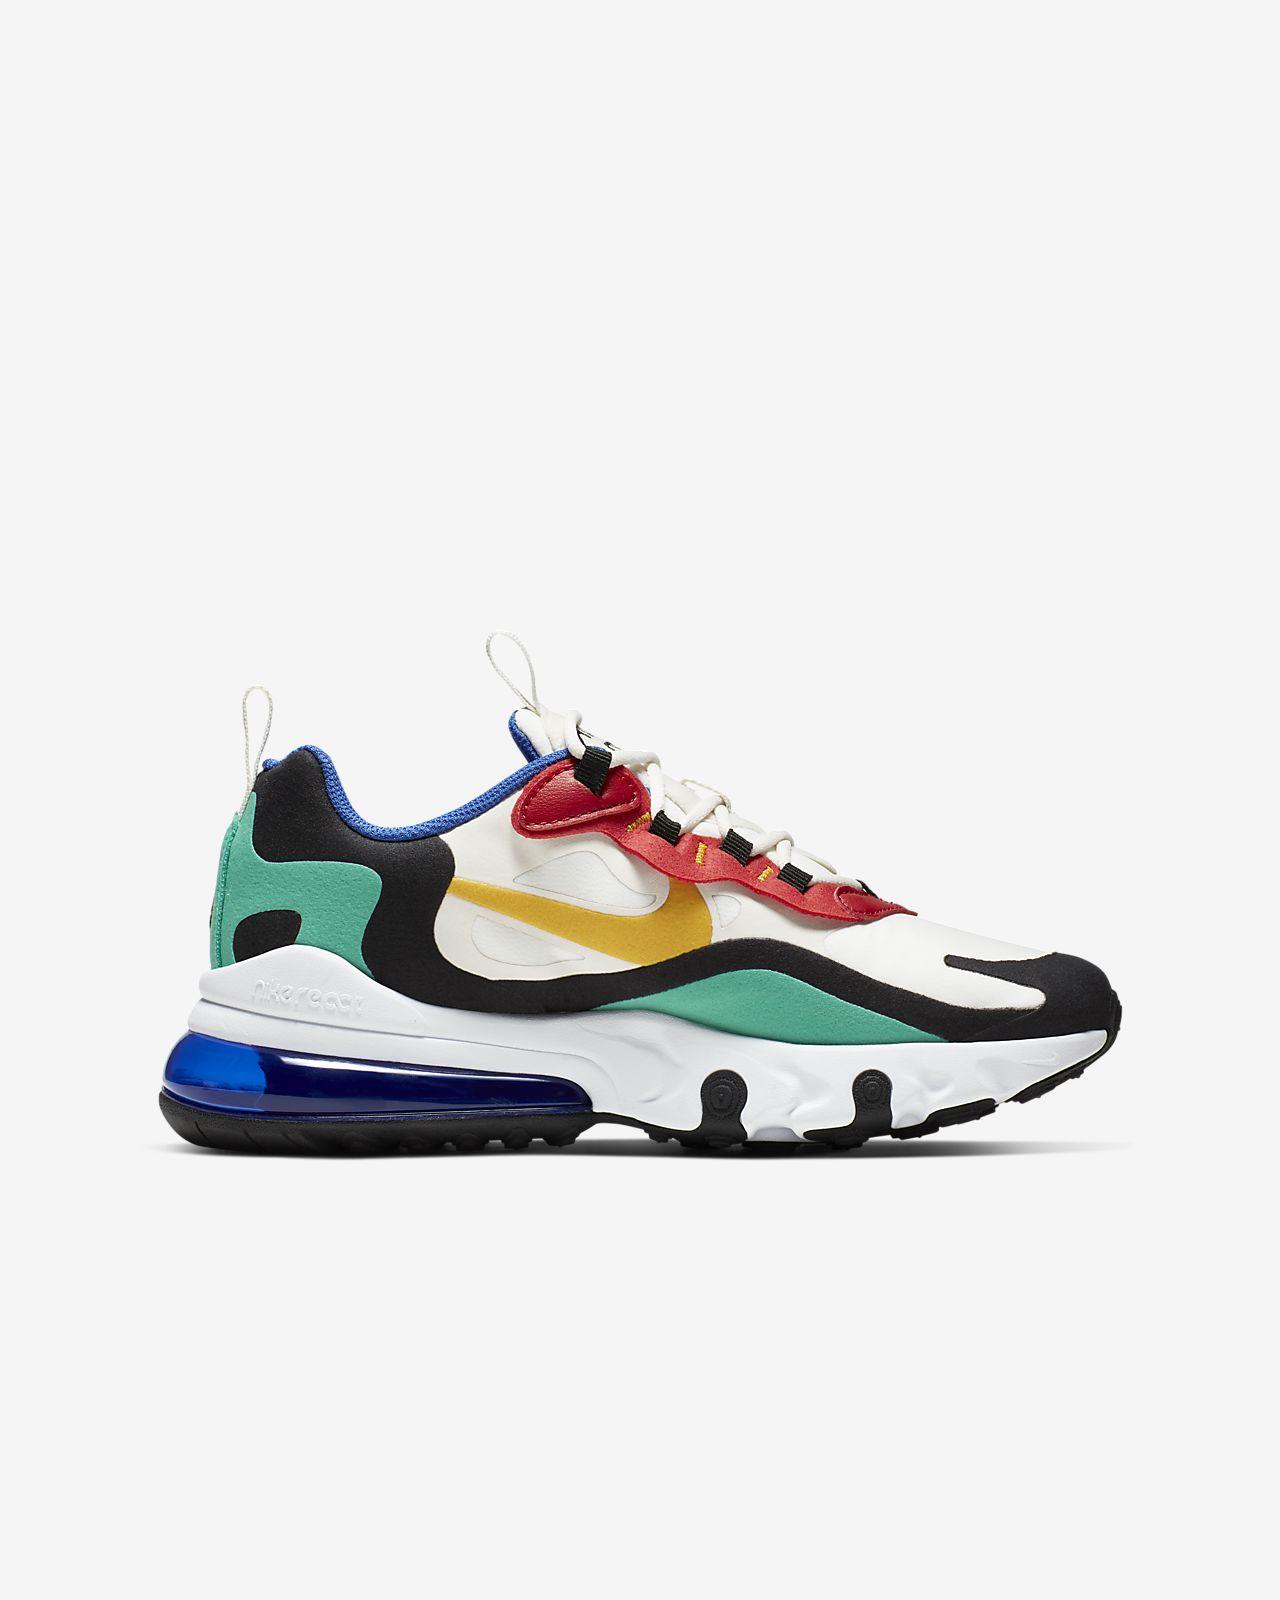 Klassisch Jungen Nike Air Max 270 Casual Schuhe, Nike Casual